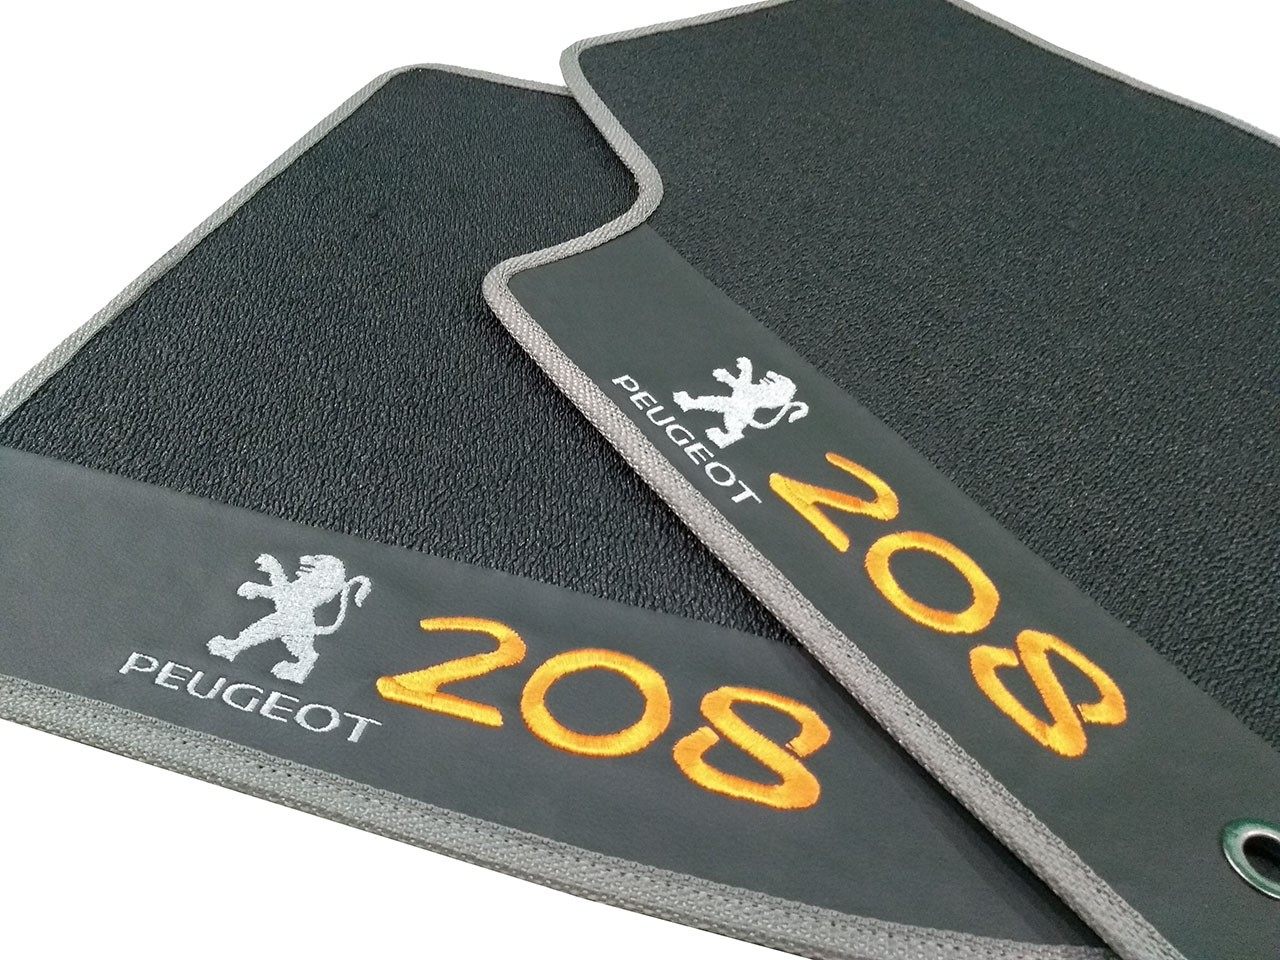 Tapete Carpete  Luxo Base Pinada 208 Gt Thp Hitto O Melhor!